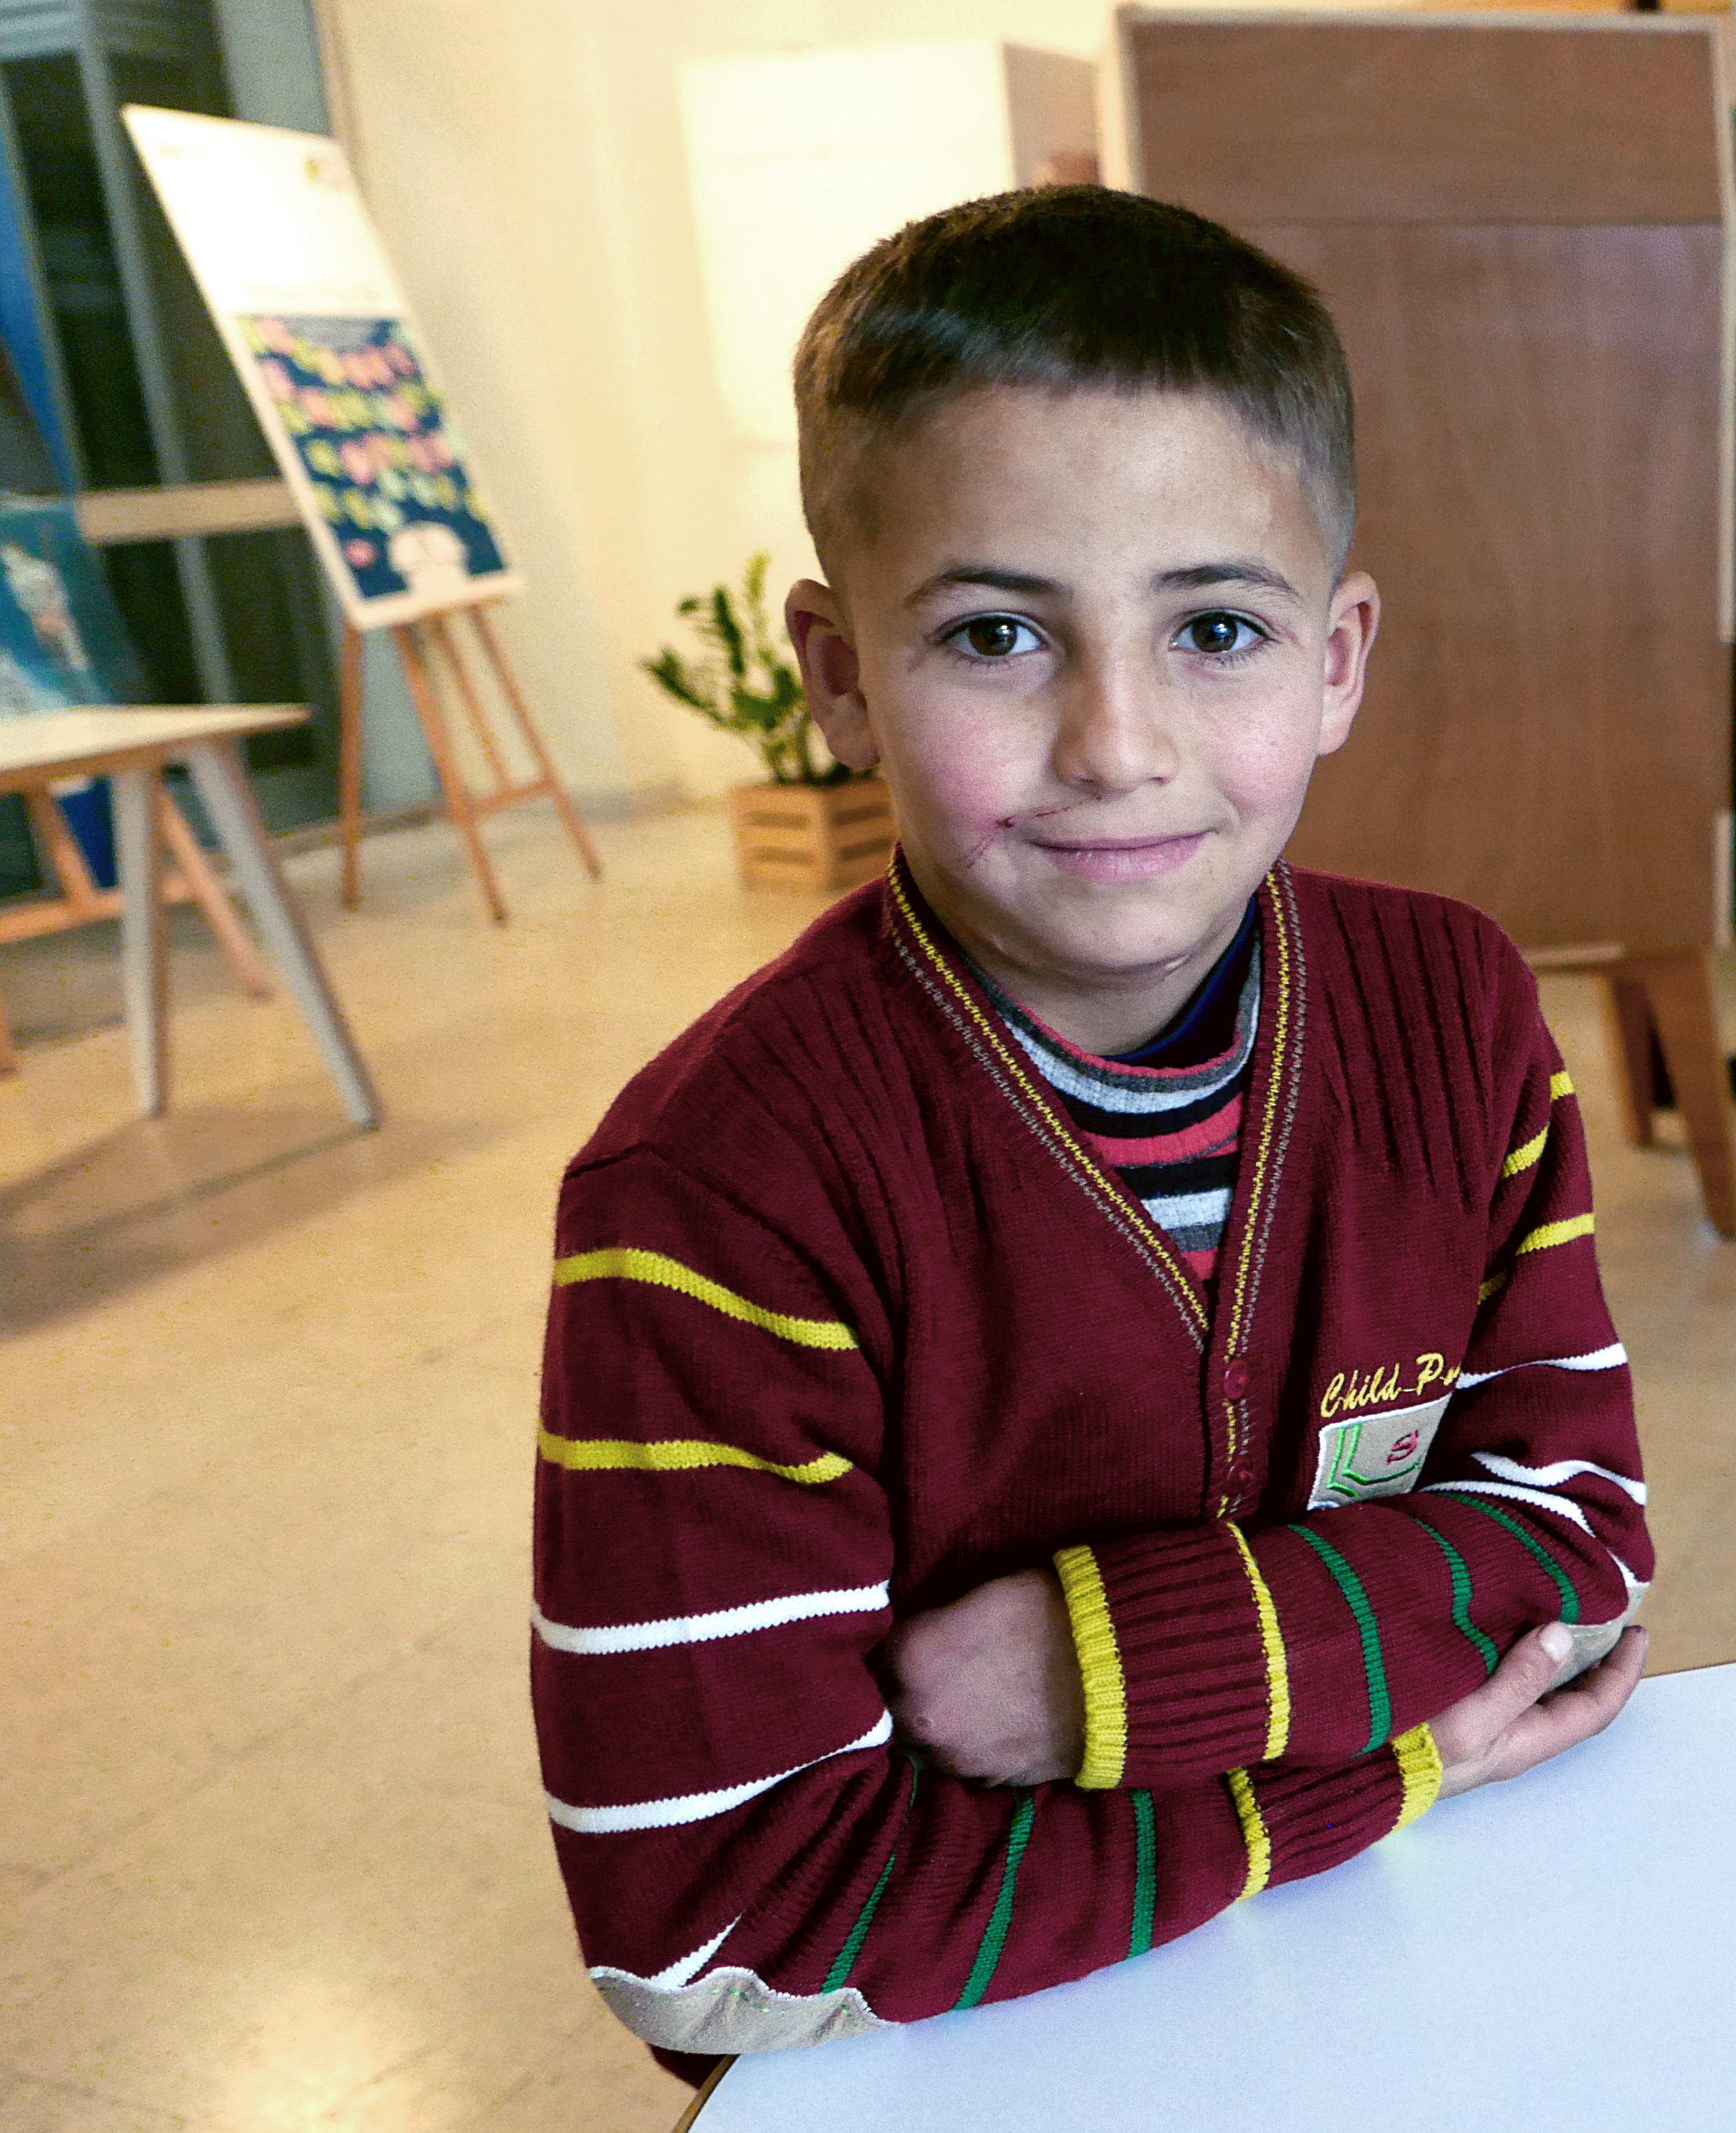 Khaled INARA Arwa Damon CNN Syrian refugee child needing medical treatment